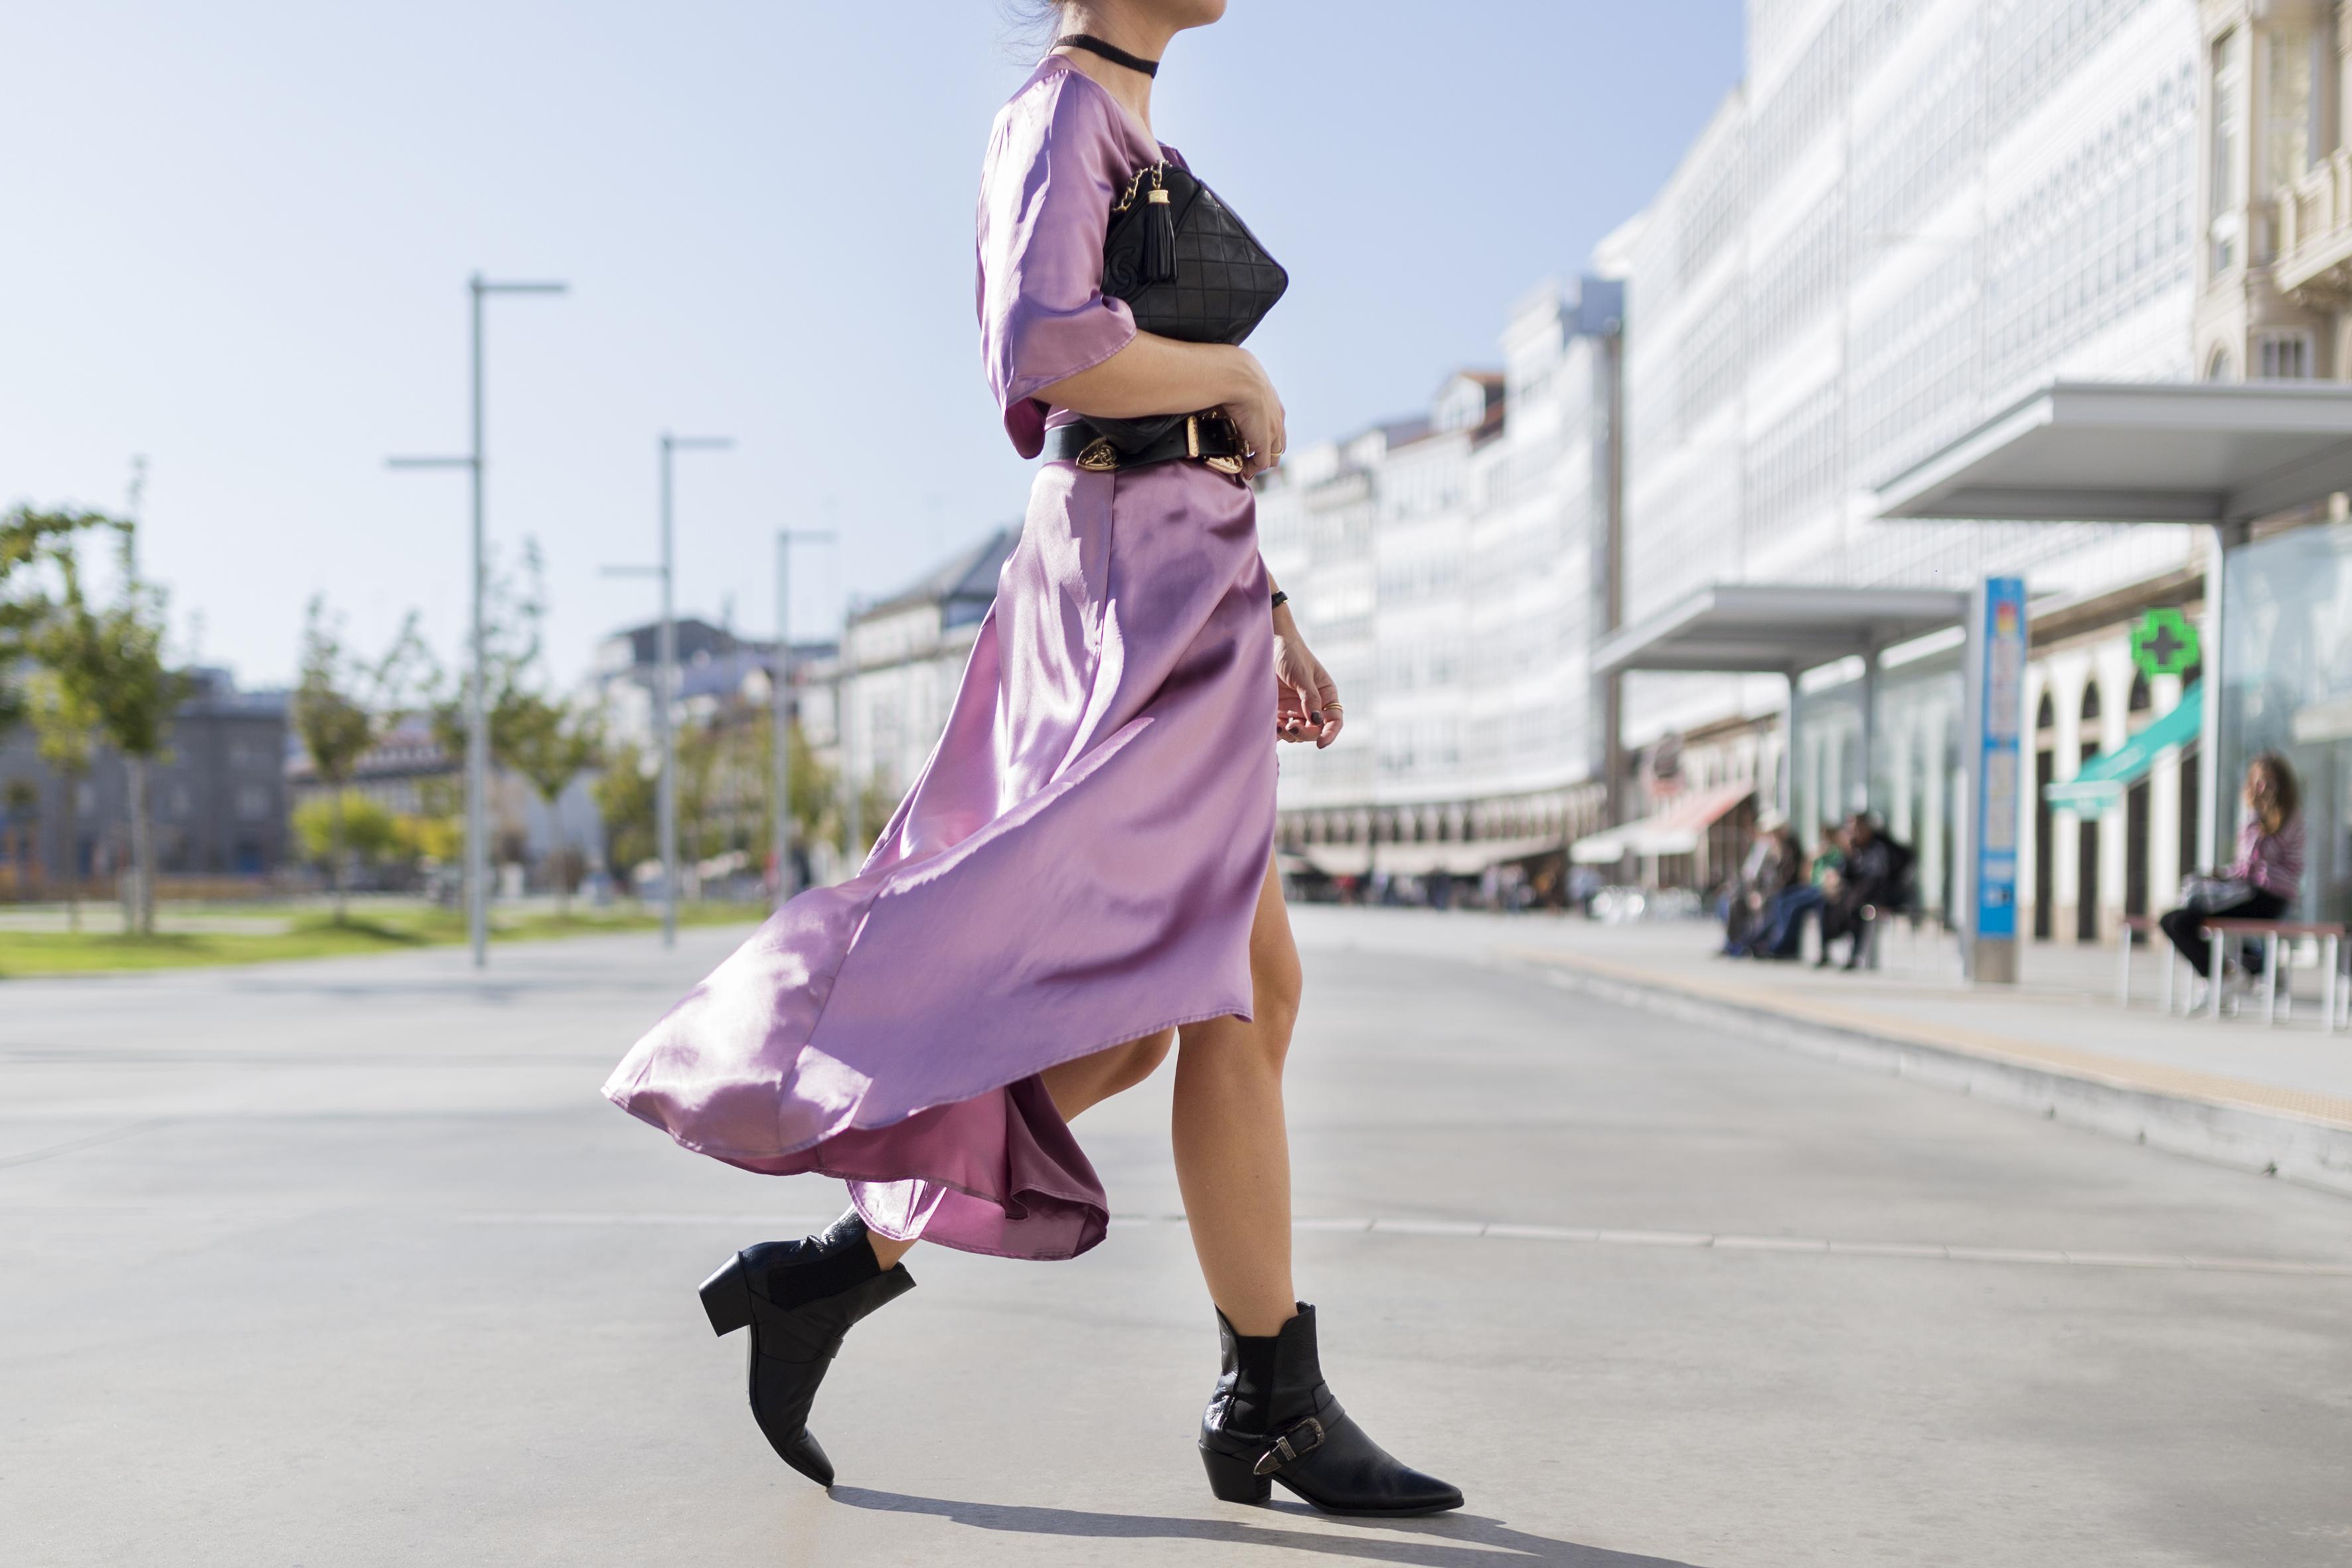 chanel vintage-StyleLovely-blogger- alba cuesta- vestido satinado - descalzaporelparque-choker zara - SHEIN - ootd - galicia - fashion -blogger - style - moda calle - streetstyle - denia priegue - video - Shein dress - chanel - vintage - botines - zara